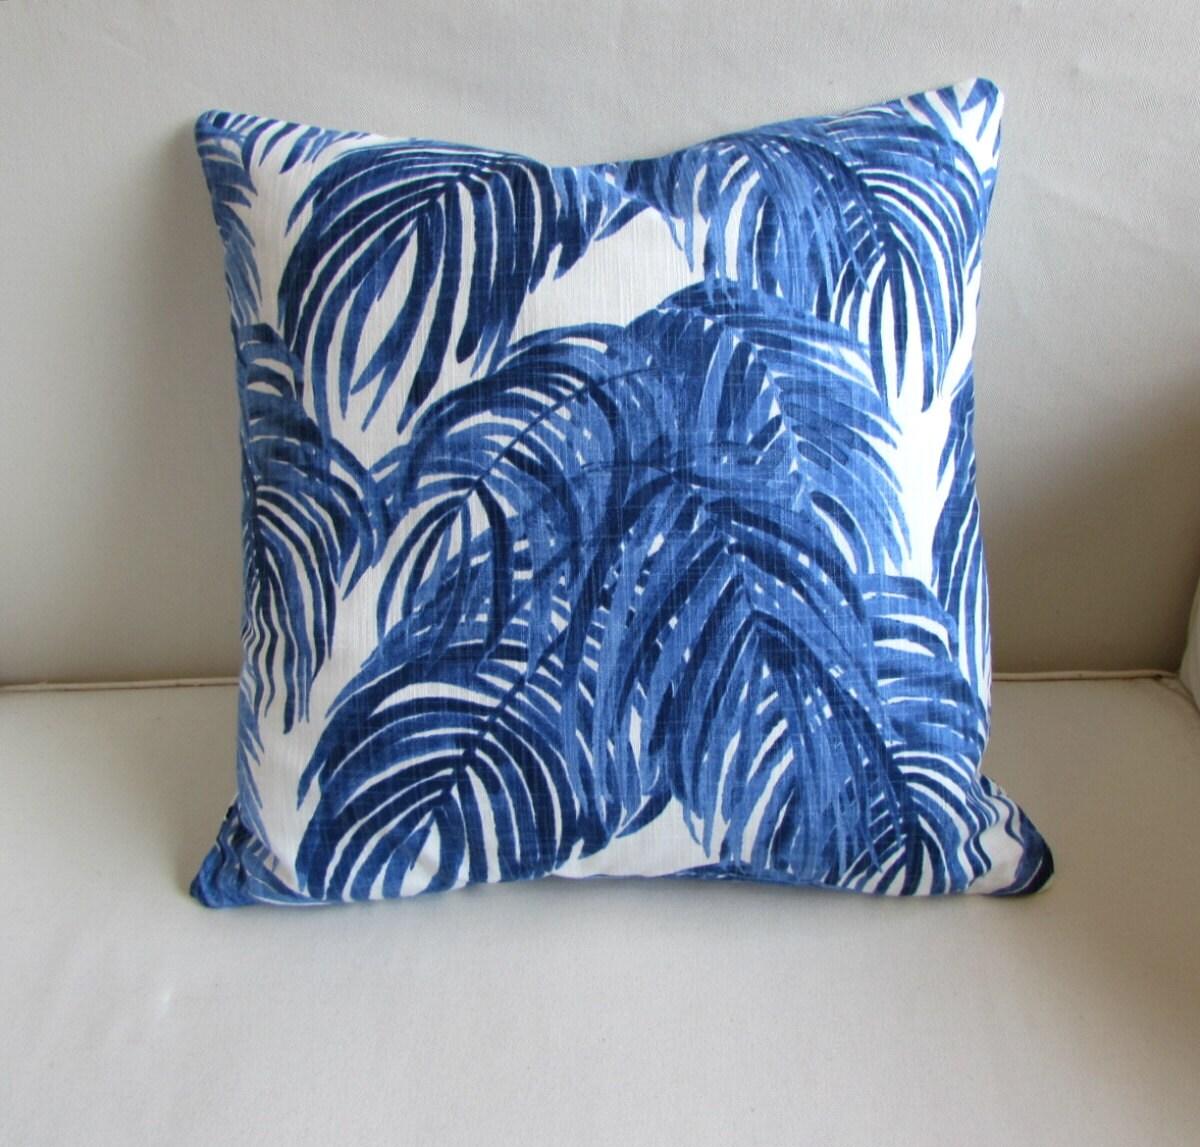 VILLA WEDGEWOOD decorative Pillow cover blue 18x18 20x20 22x22